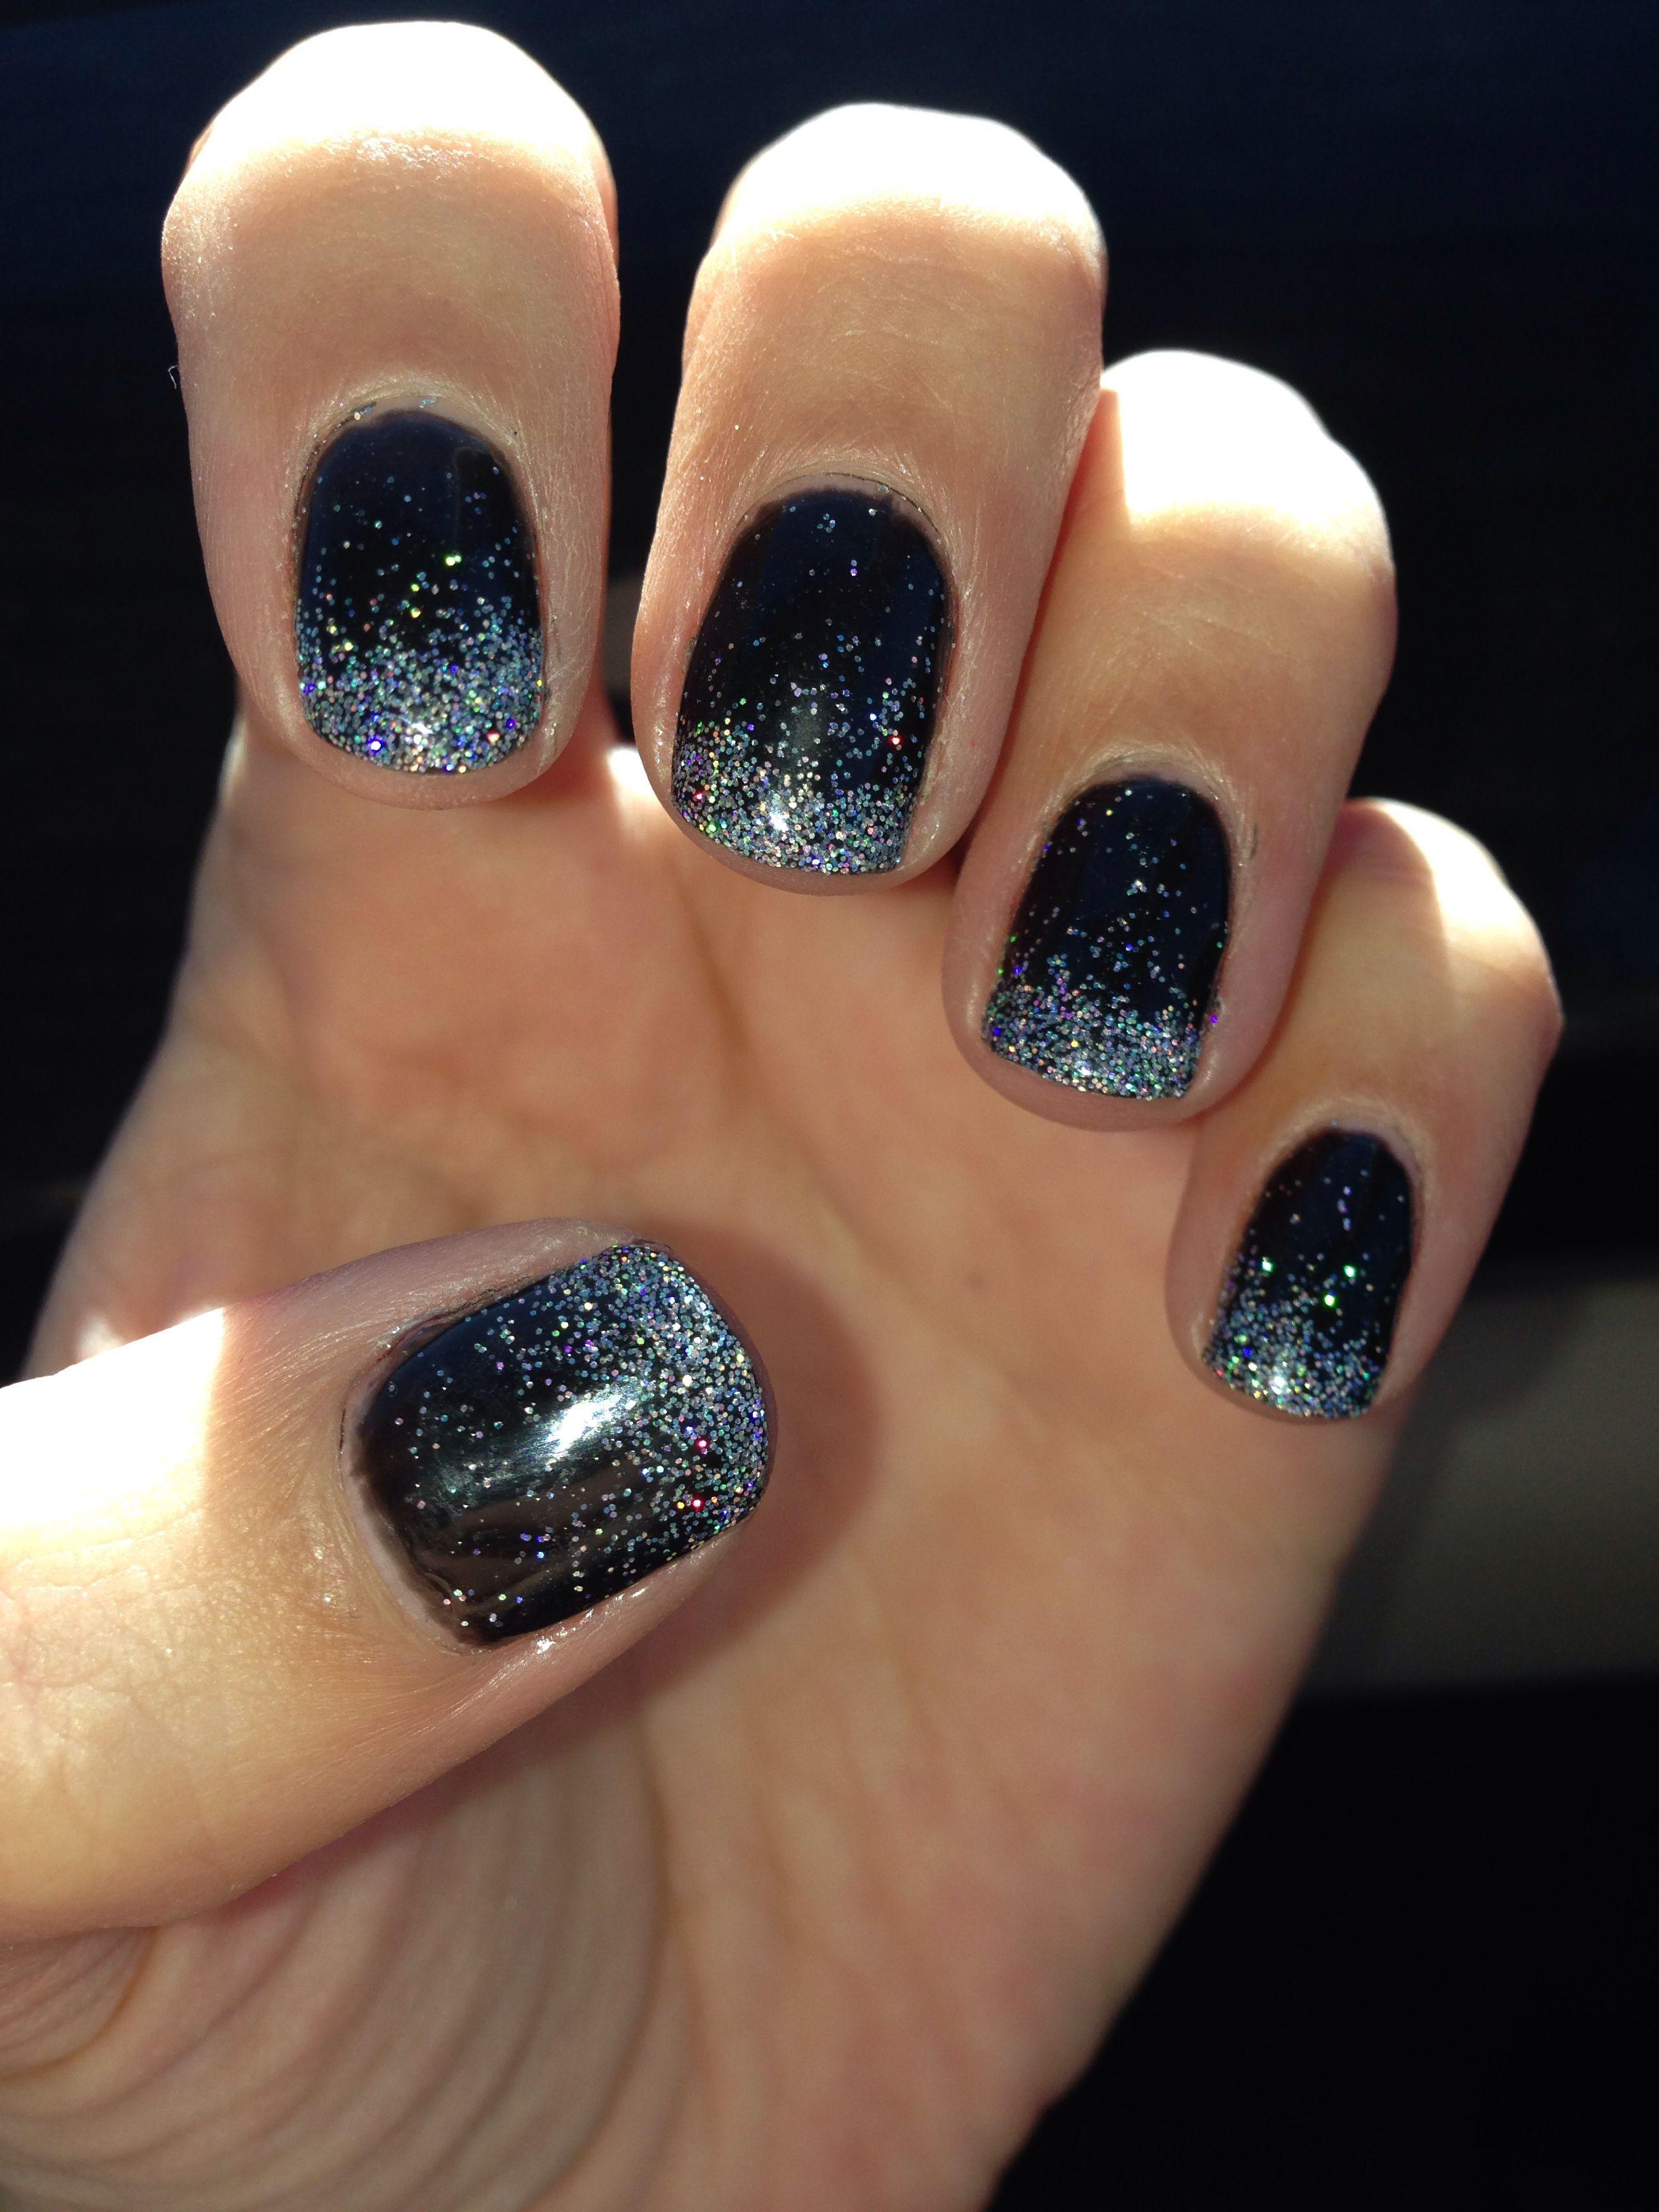 shellac nails #blackpool